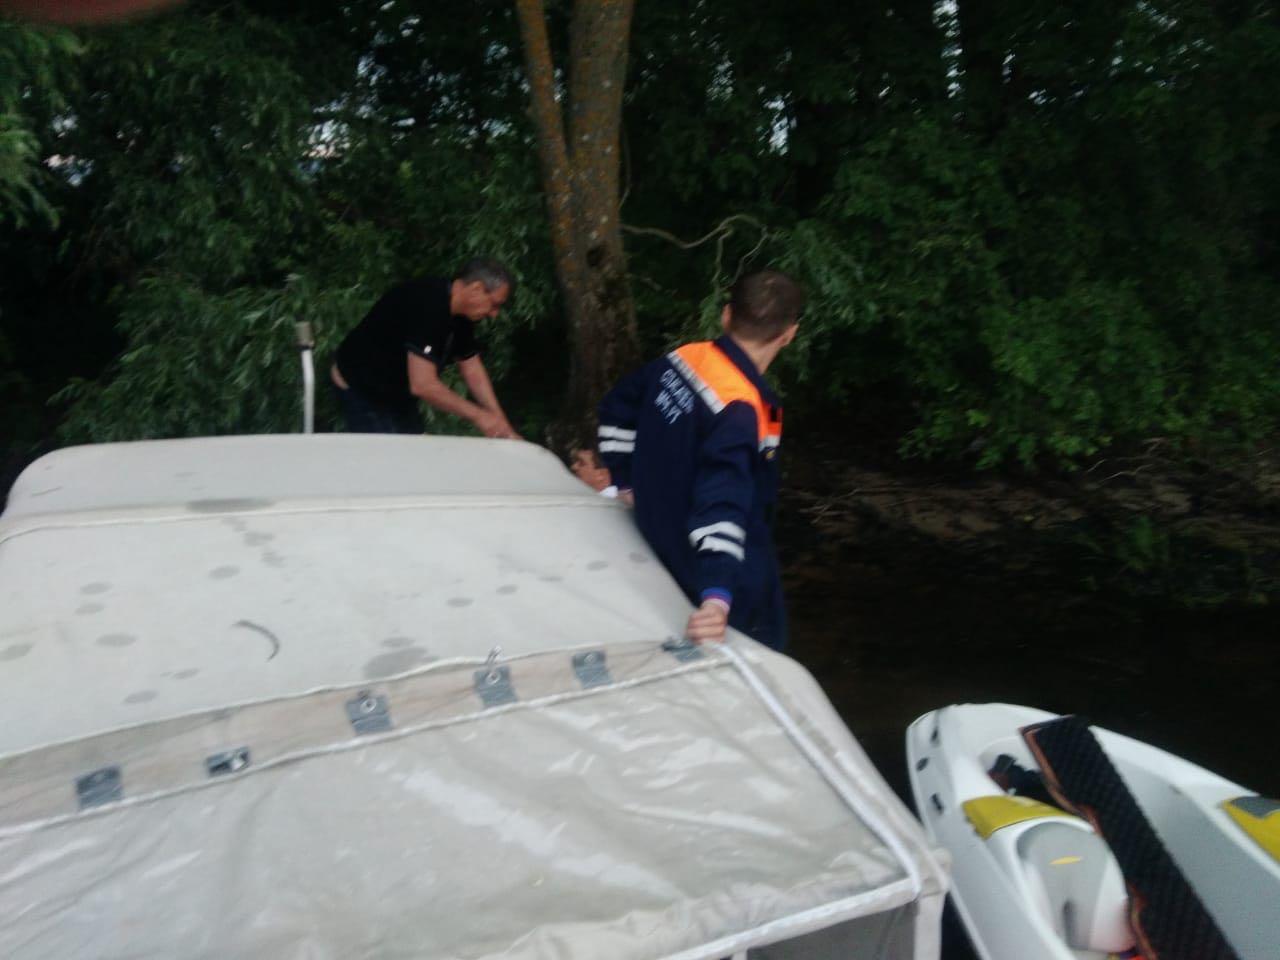 В Татарстане едва не утонул катер с пьяным водителем - фото